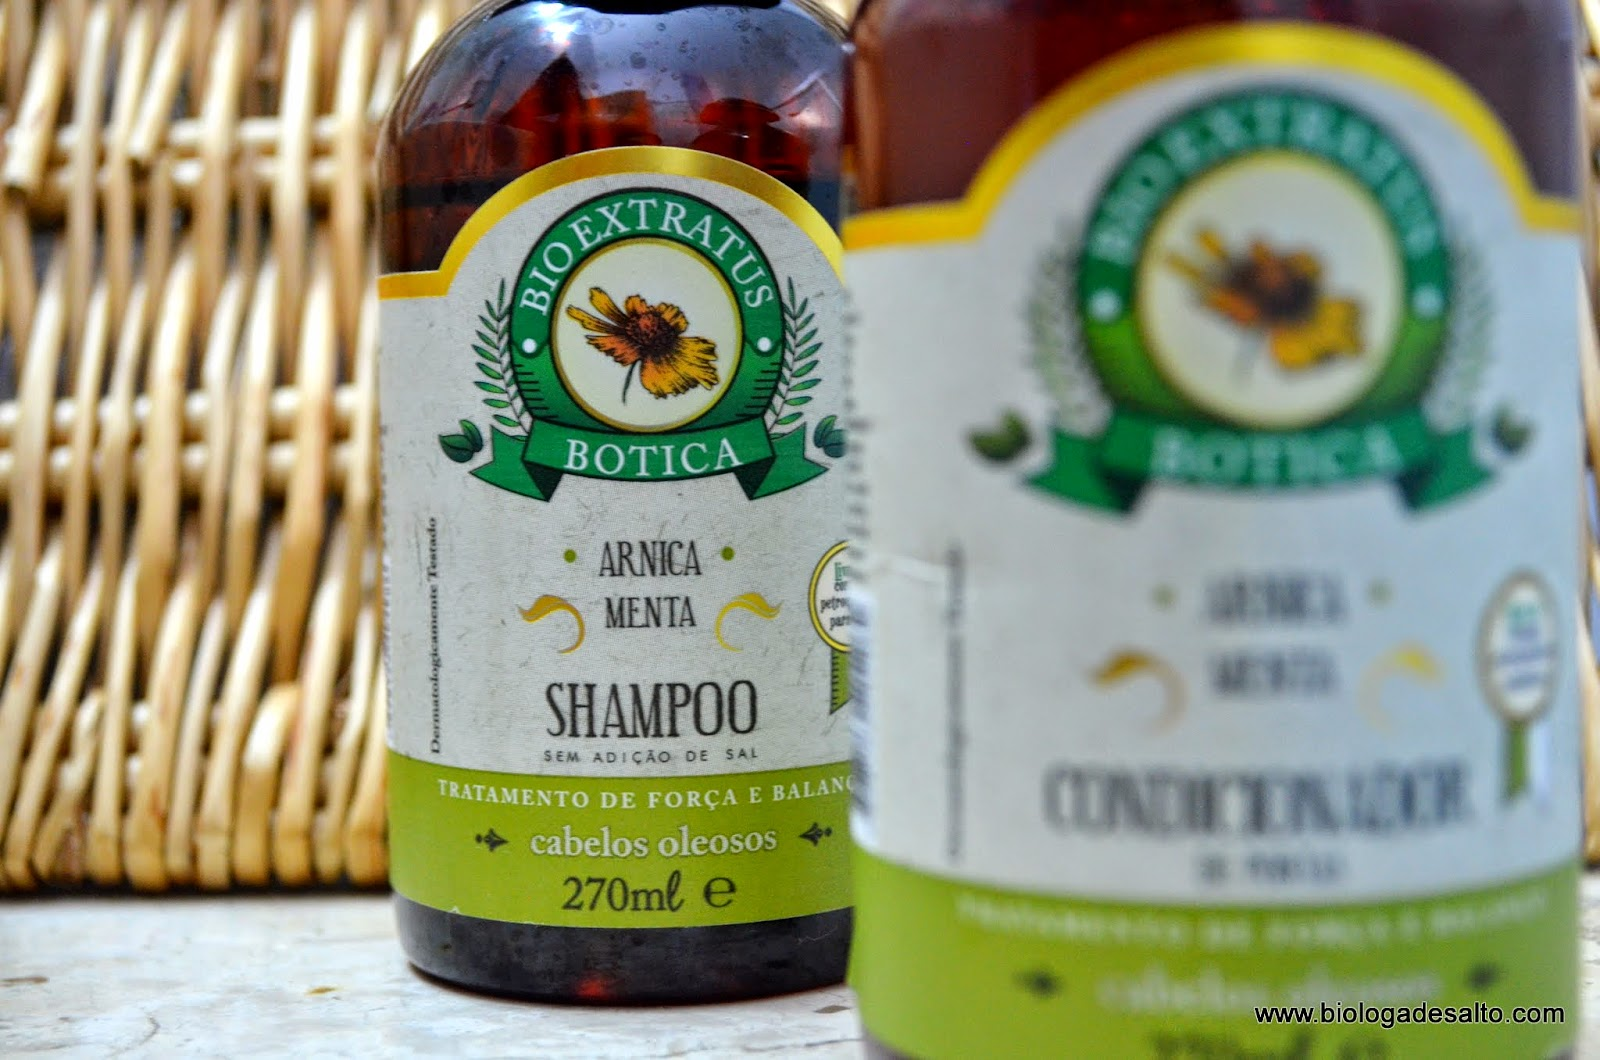 shampoo para cabelo oleoso